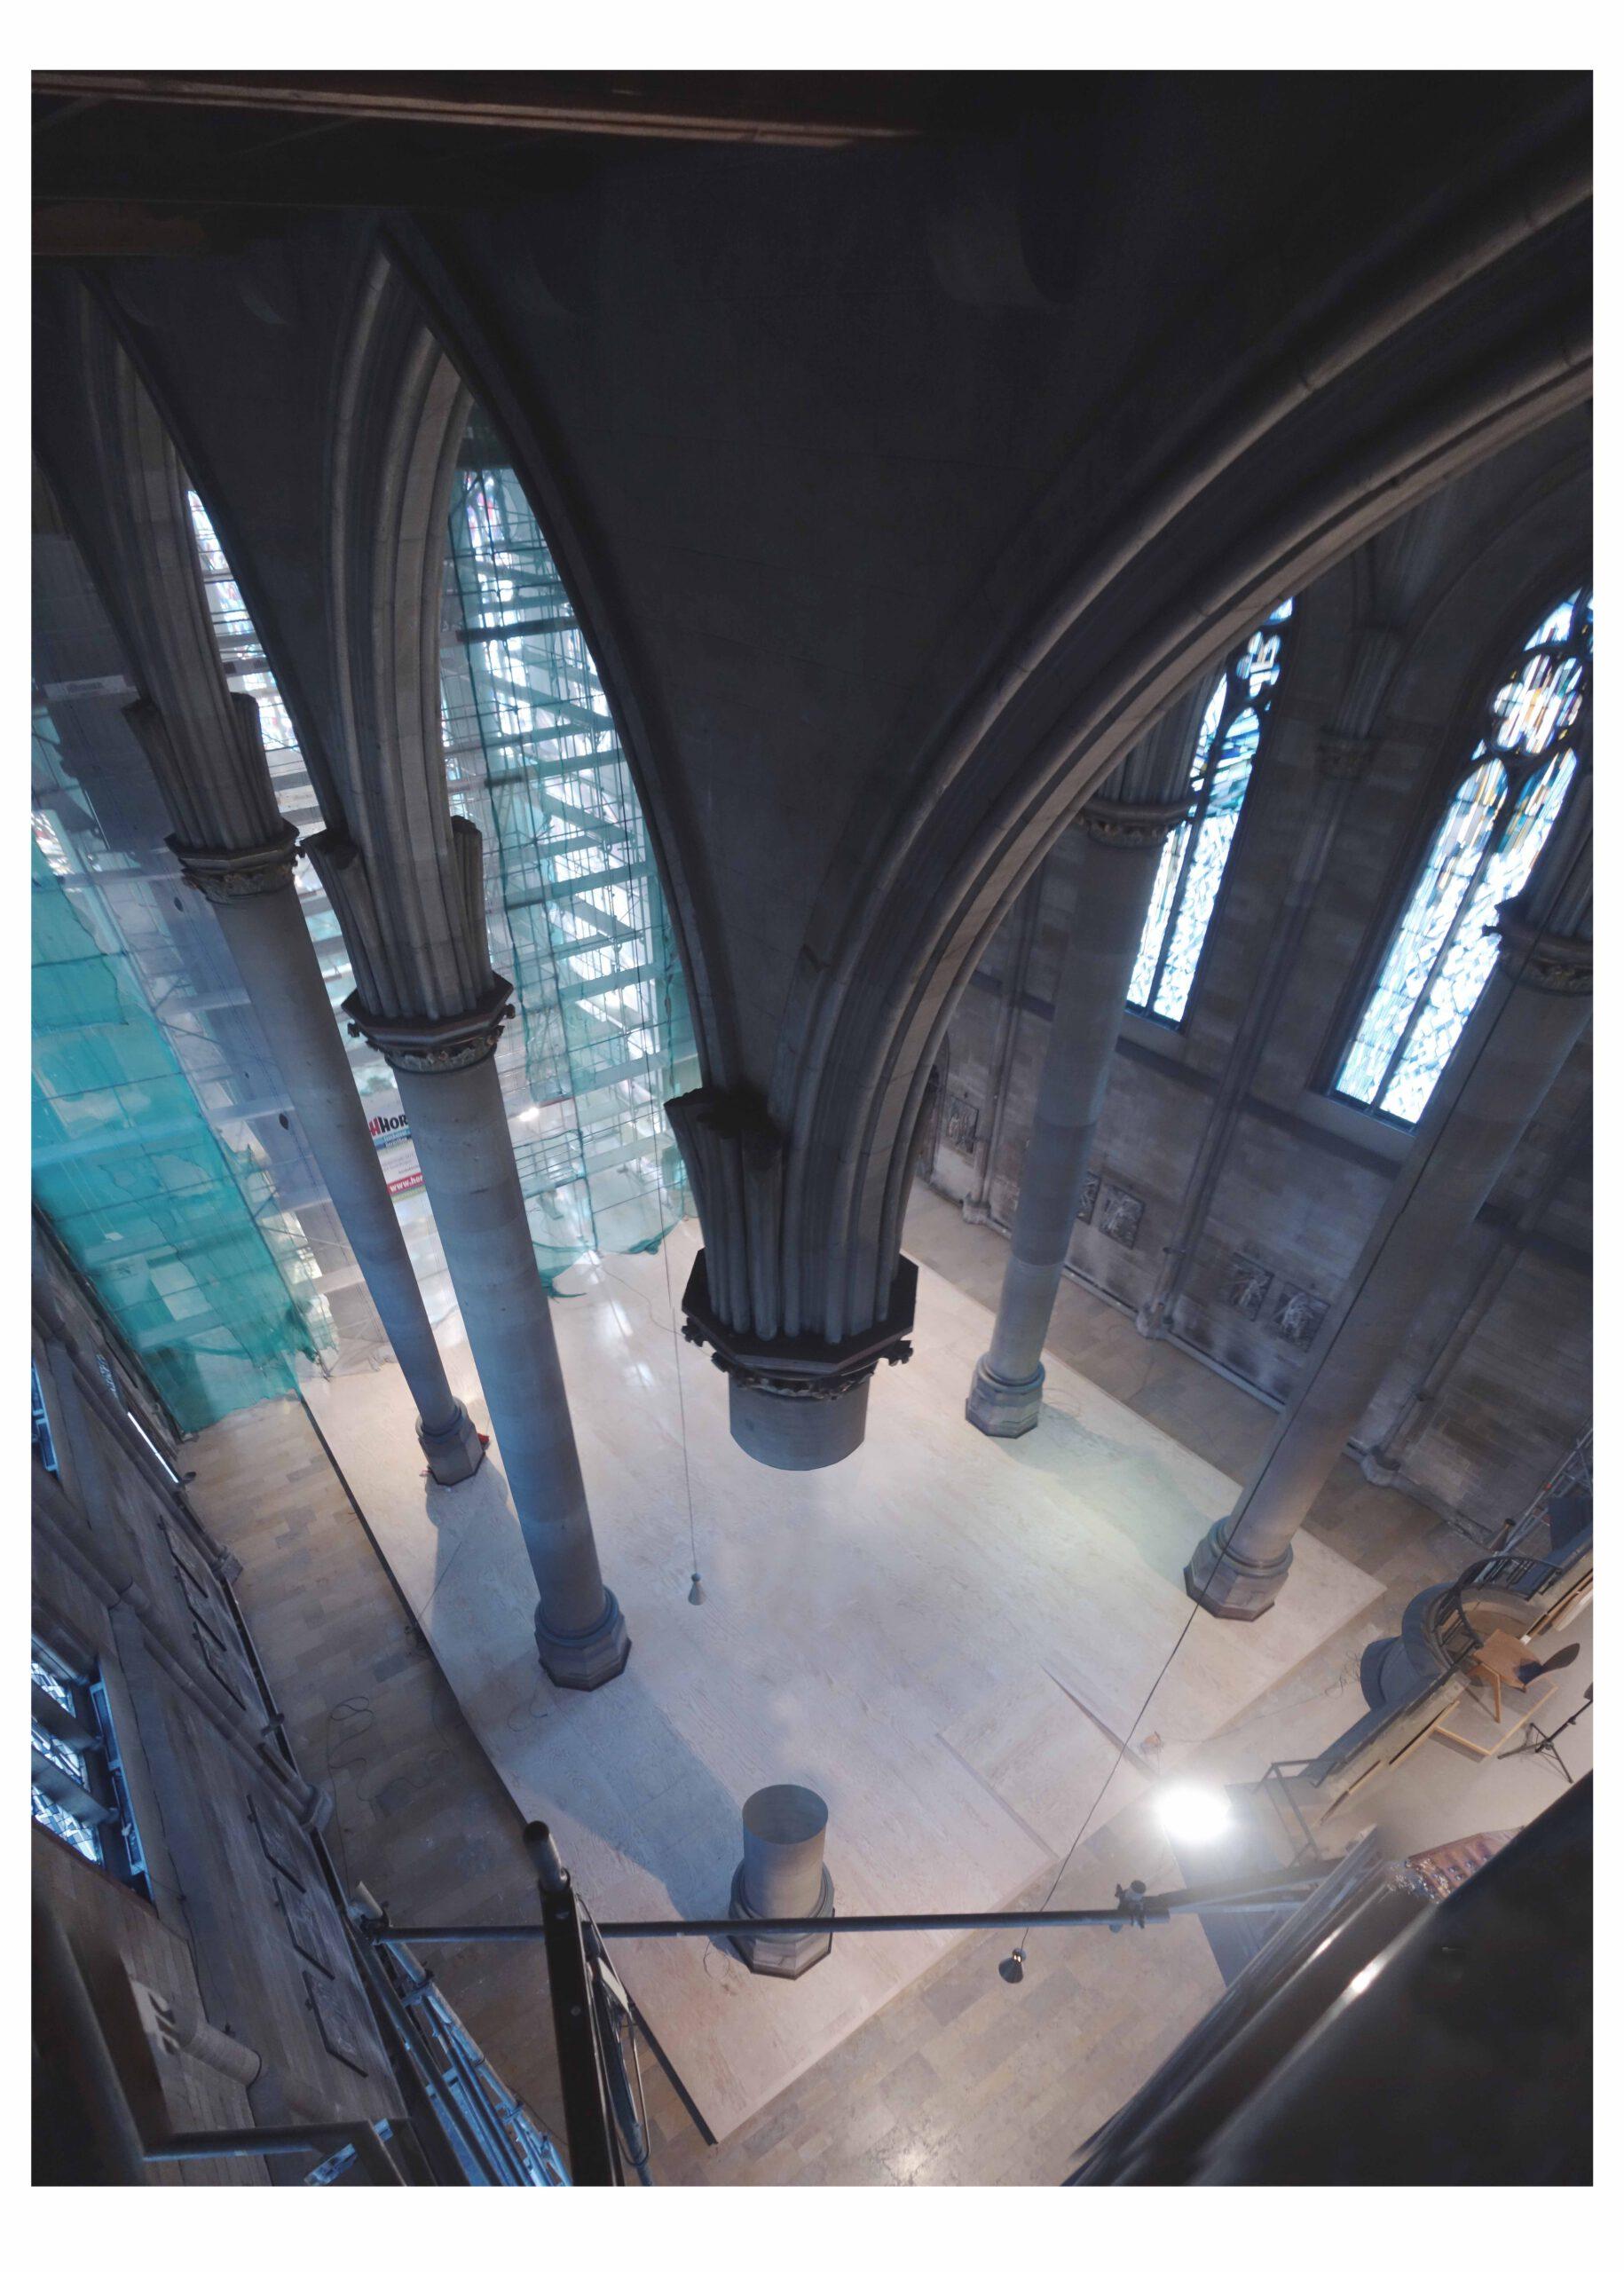 st maria als prozess sebastian klawiter stuttgart katholische kirche stadtraum prozess provisorium dialogmöbel